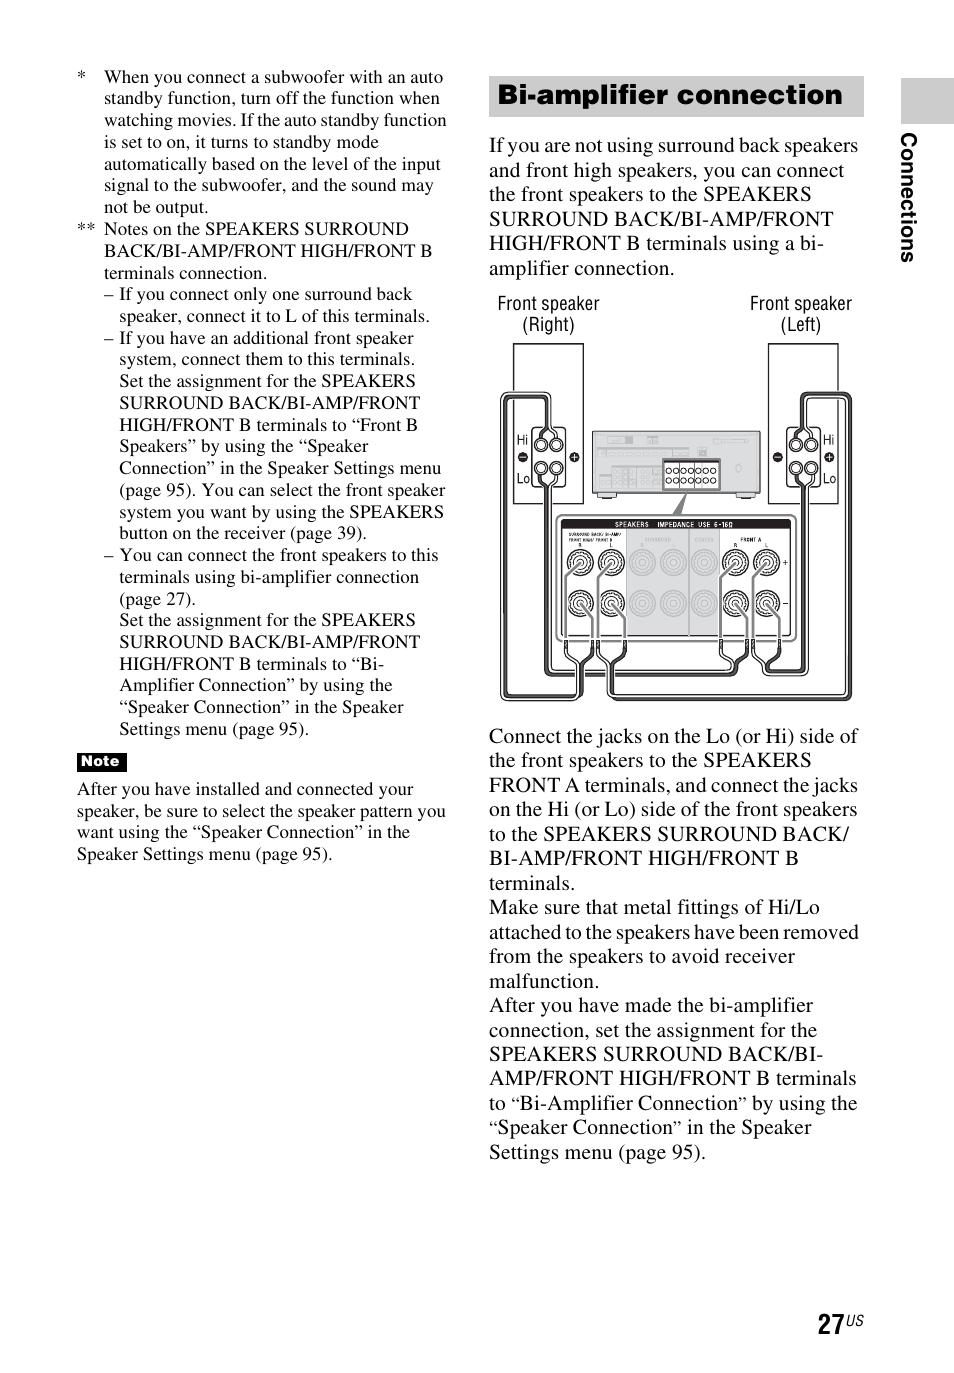 Sony Amp Manuals 1845c Wiring Diagram Back Up Alarm Array Bi Amplifier Connection Str Dn1040 User Manual Page 27 Rh Manualsdir Com